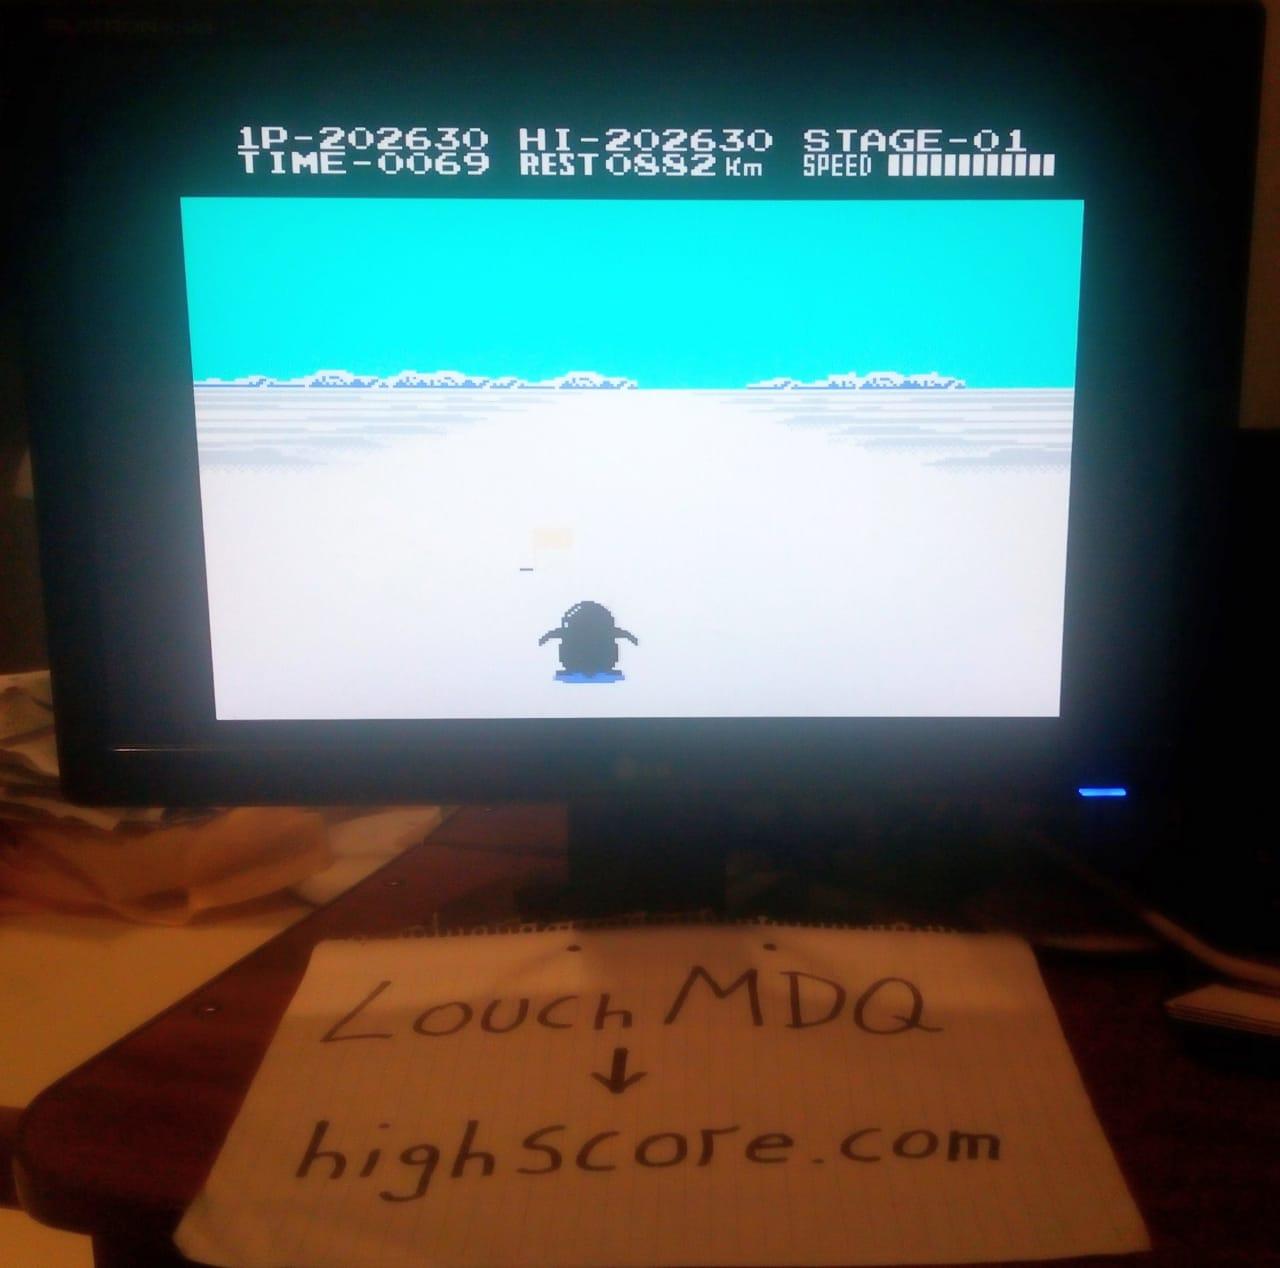 LouchMDQ: Antarctic Adventure: Level 2 Start (NES/Famicom Emulated) 202,630 points on 2020-06-22 03:59:18